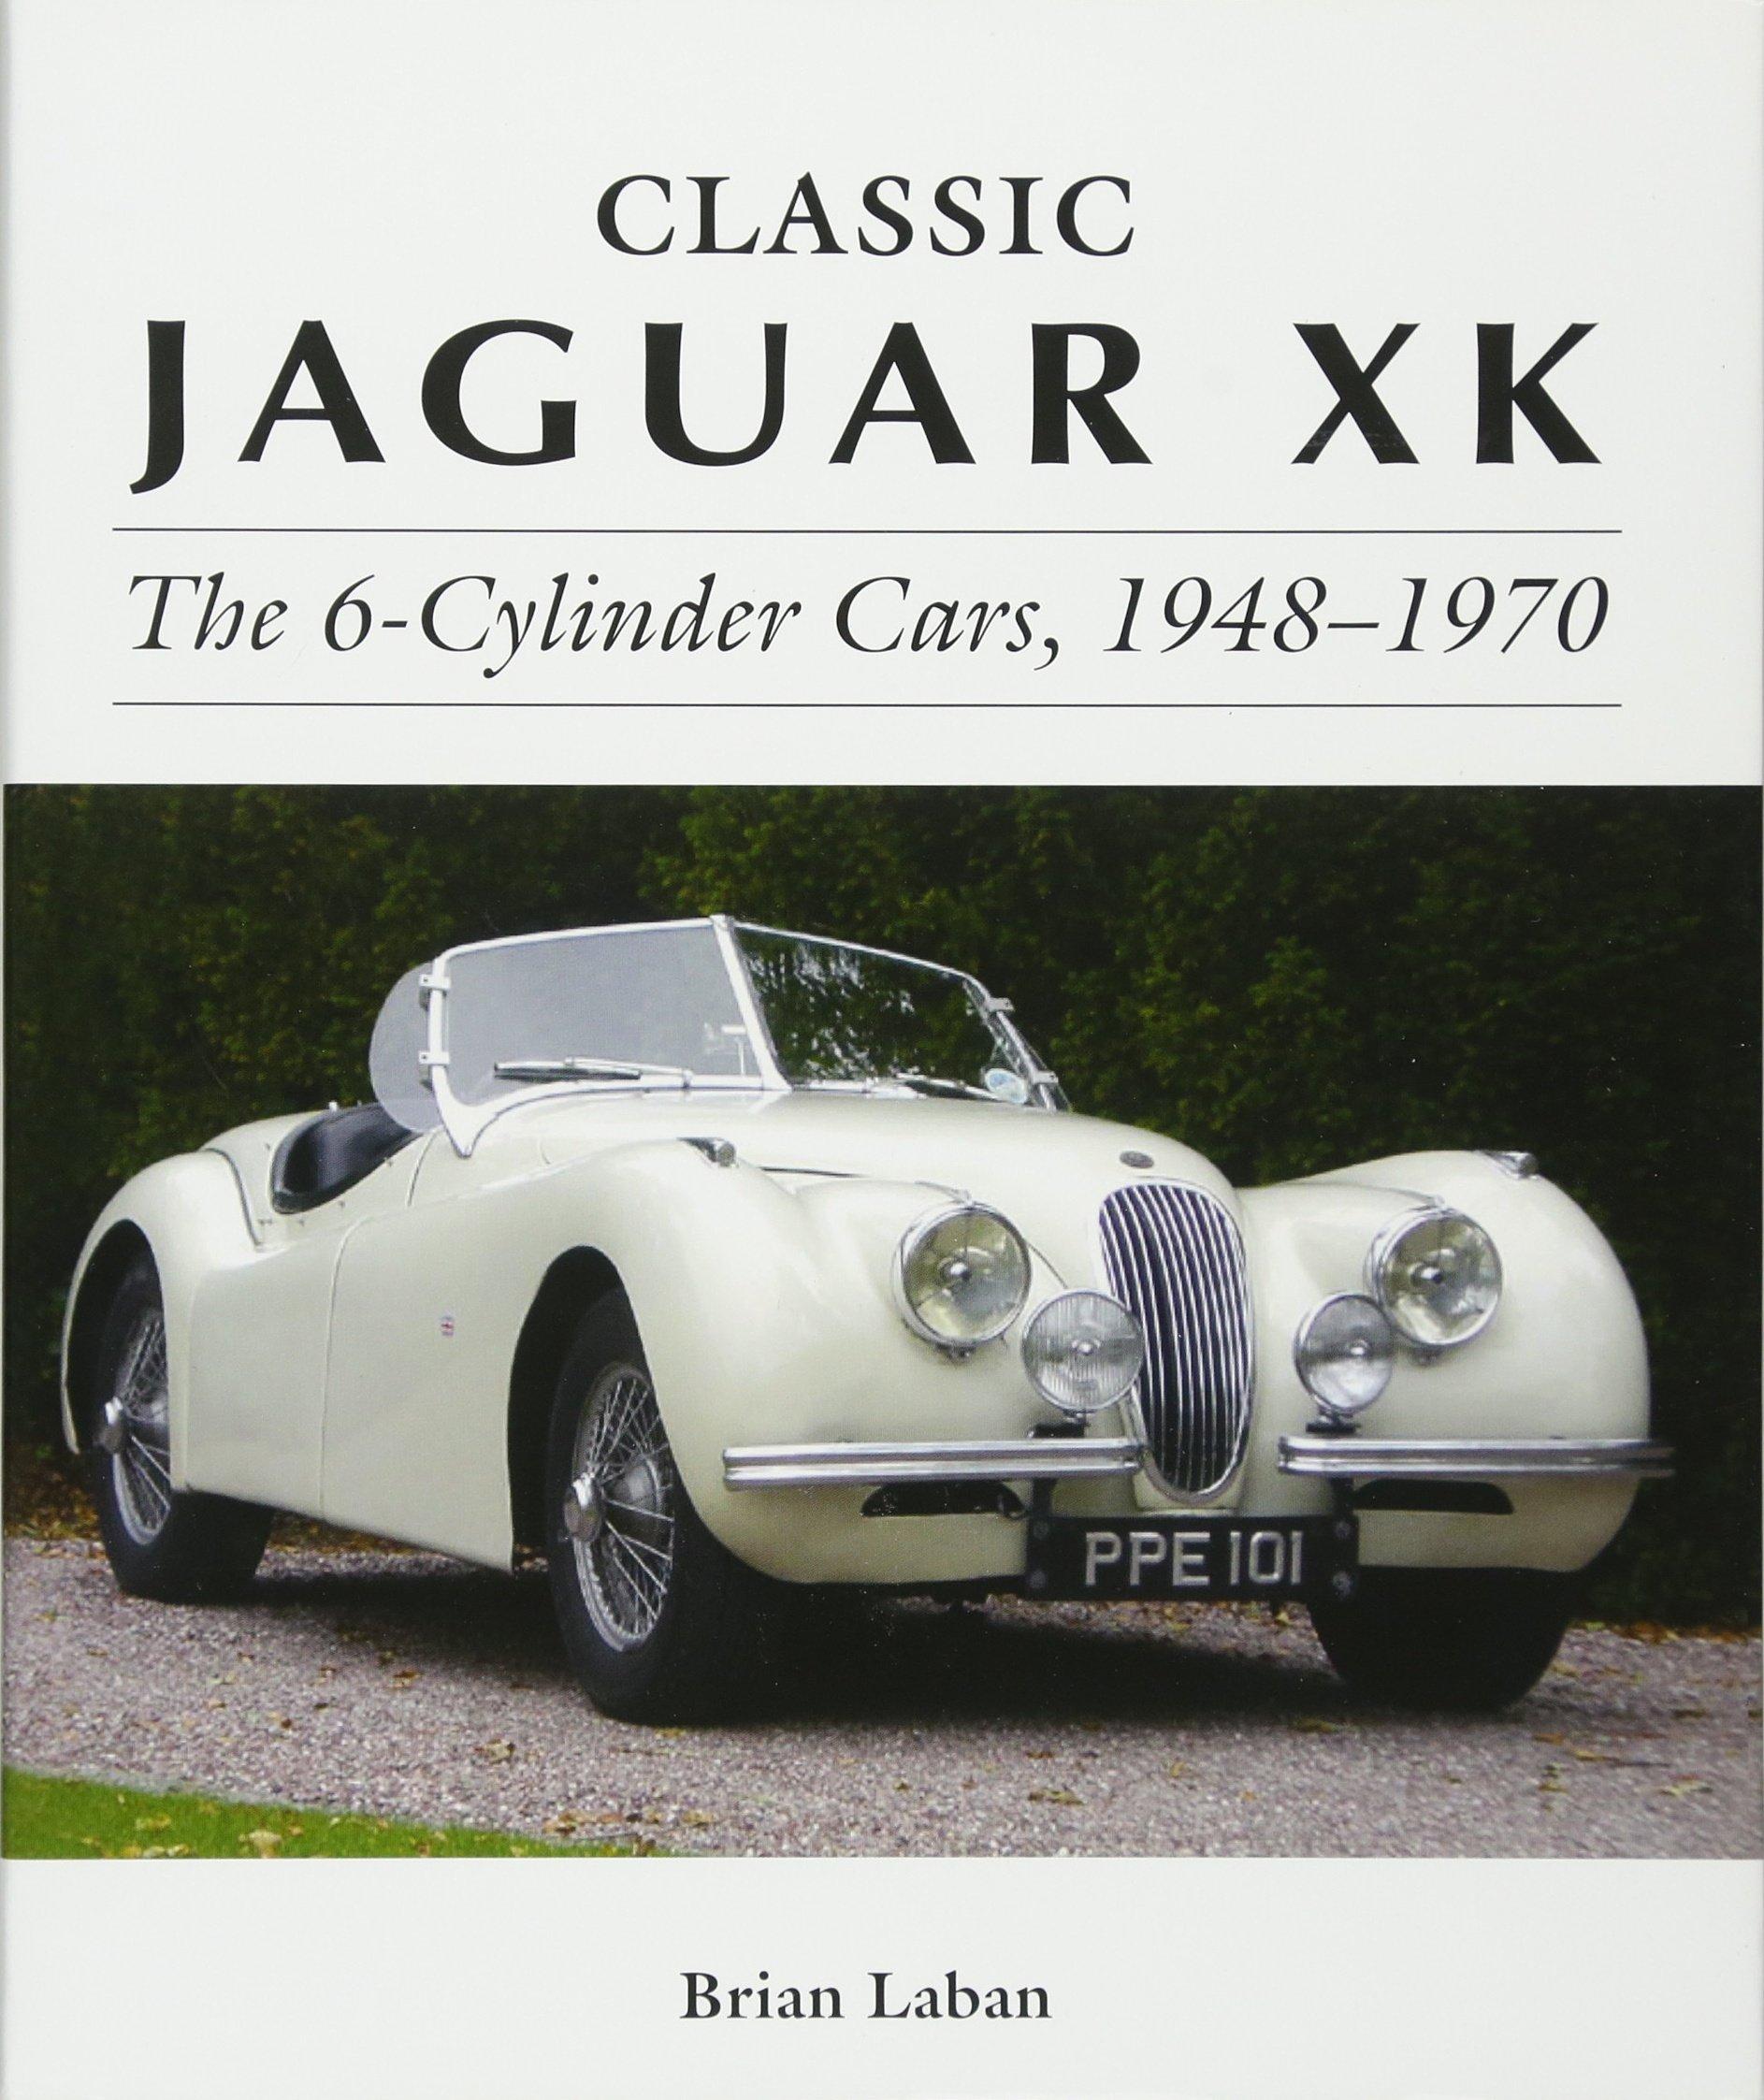 Classic Jaguar XK: The 6-Cylinder Cars, 1948-1970 (Crowood Autoclassics) PDF